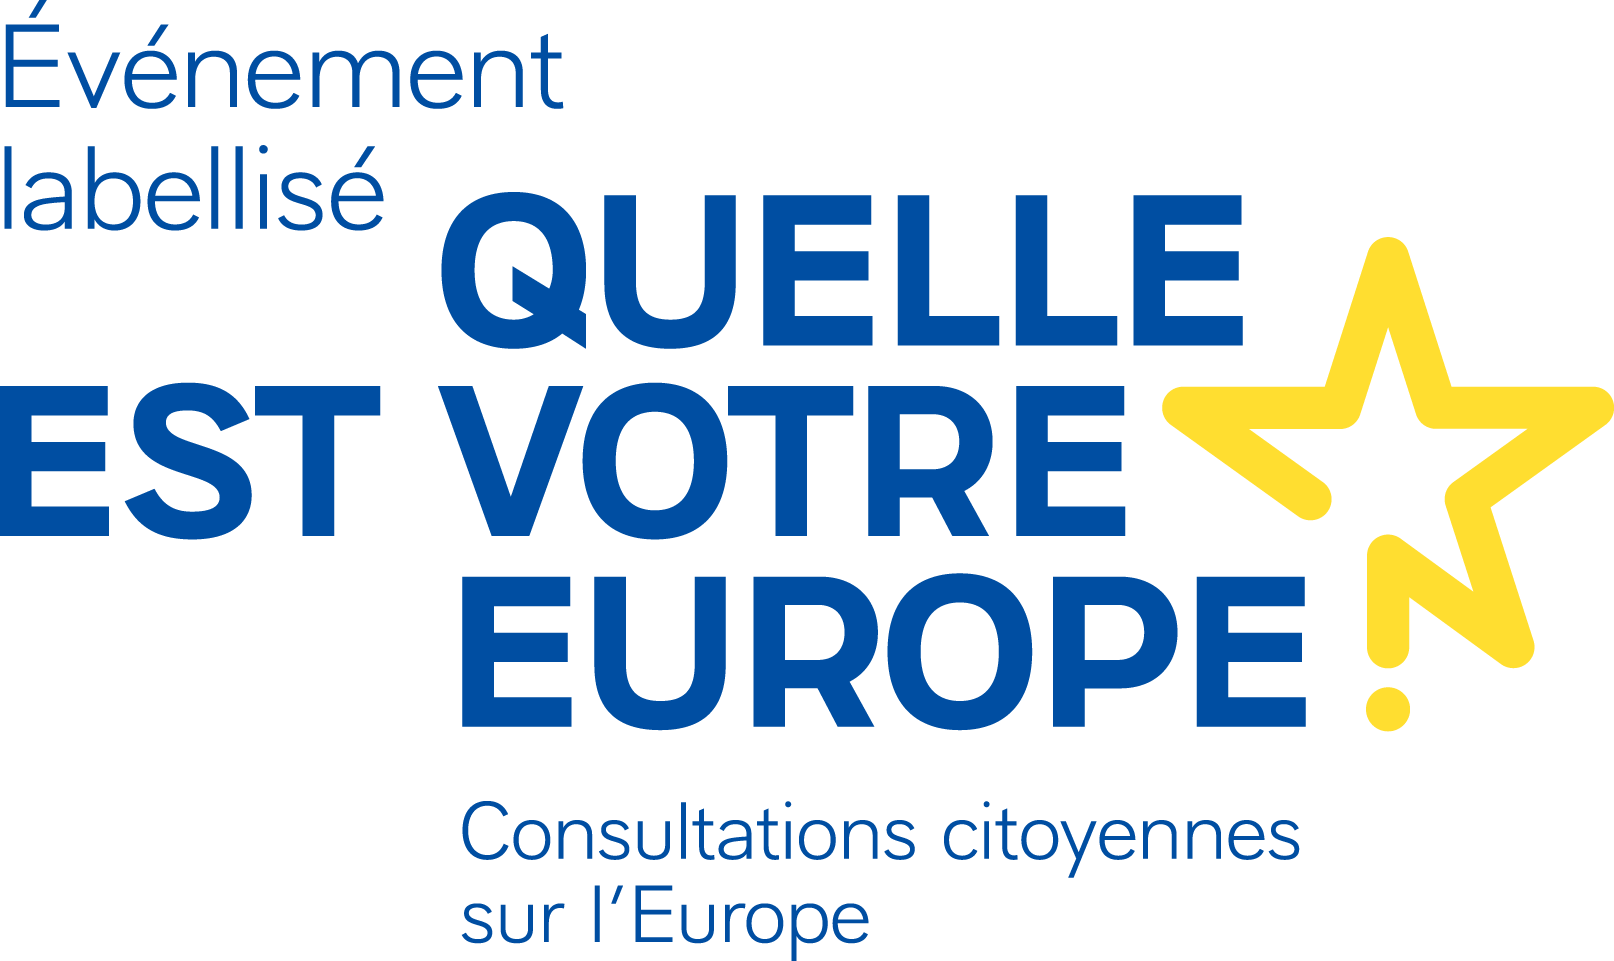 ☆ Consultations citoyennes sur l'Europe